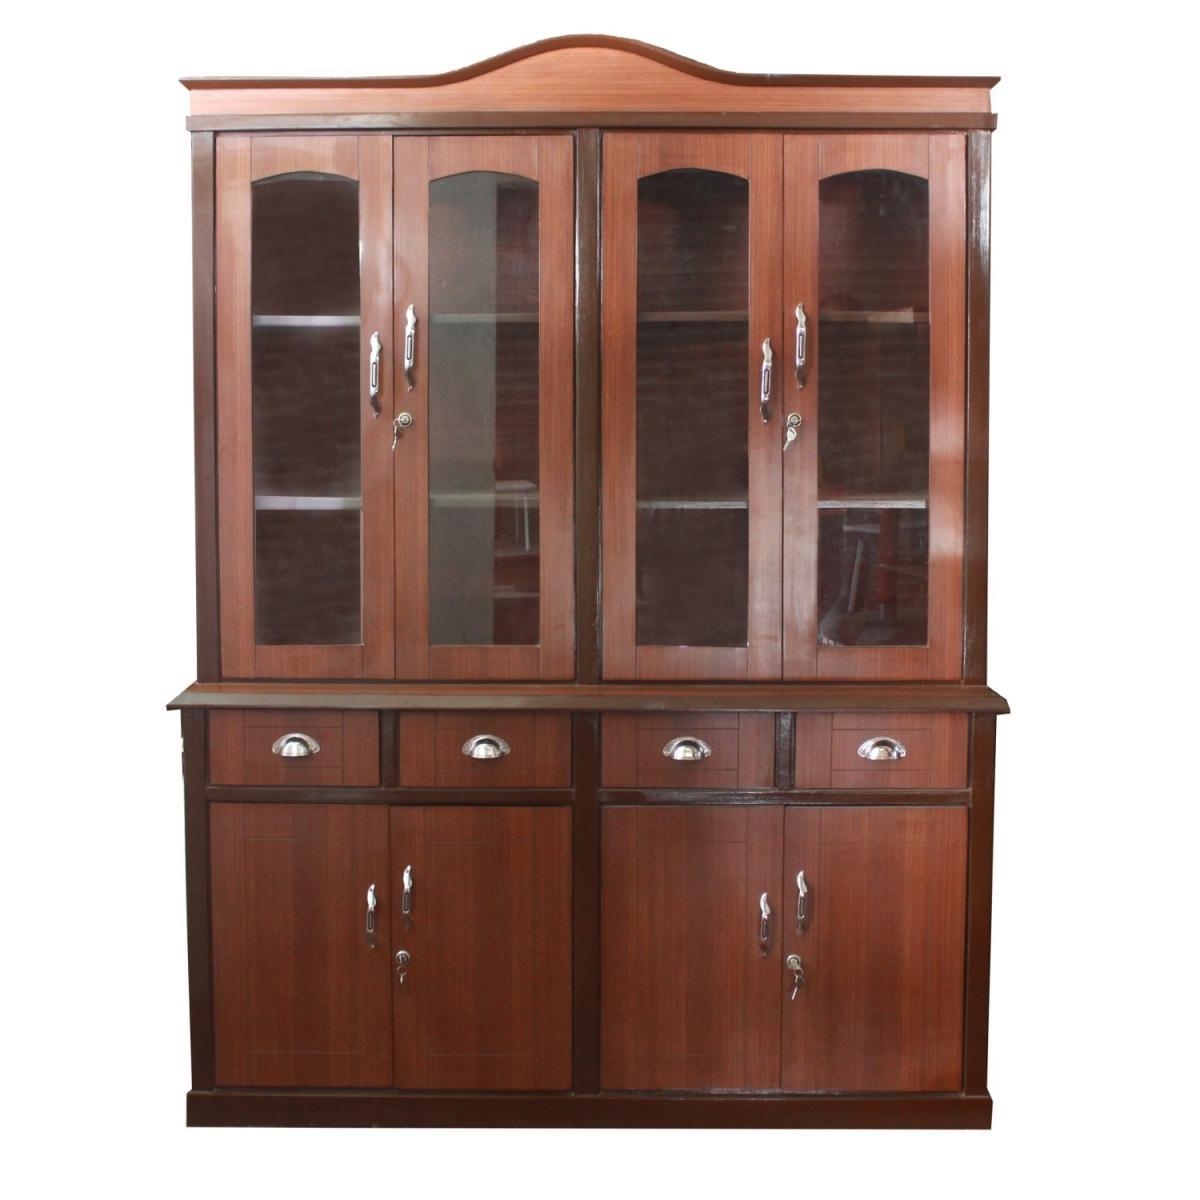 Furniture Price In Nepal Buy Home Furniture Online Daraz Com Np